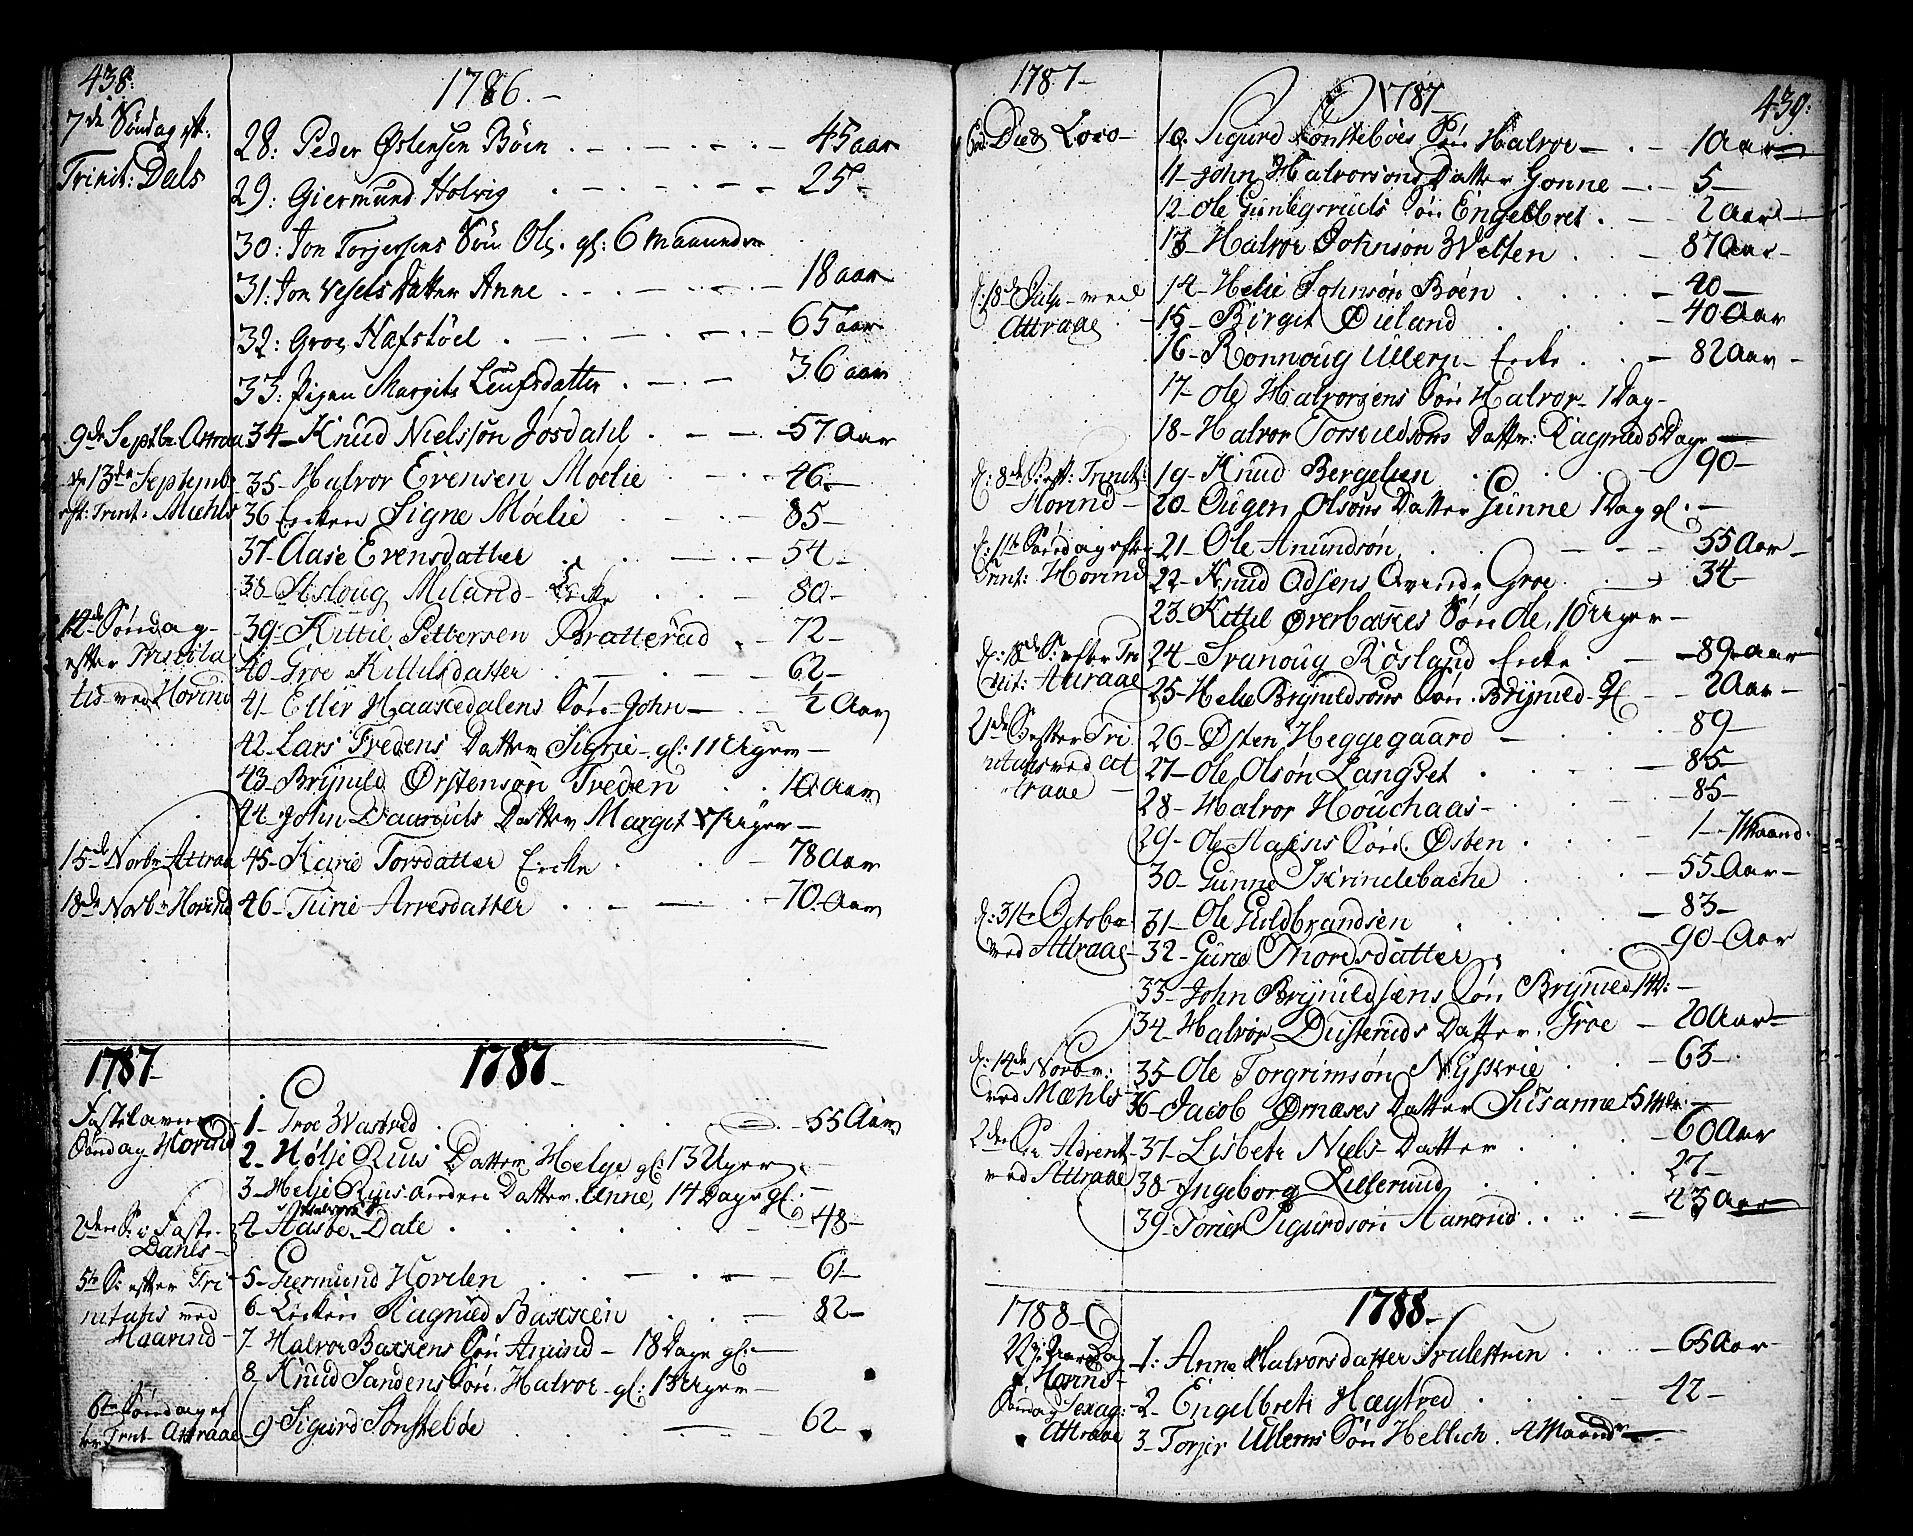 SAKO, Tinn kirkebøker, F/Fa/L0002: Ministerialbok nr. I 2, 1757-1810, s. 438-439